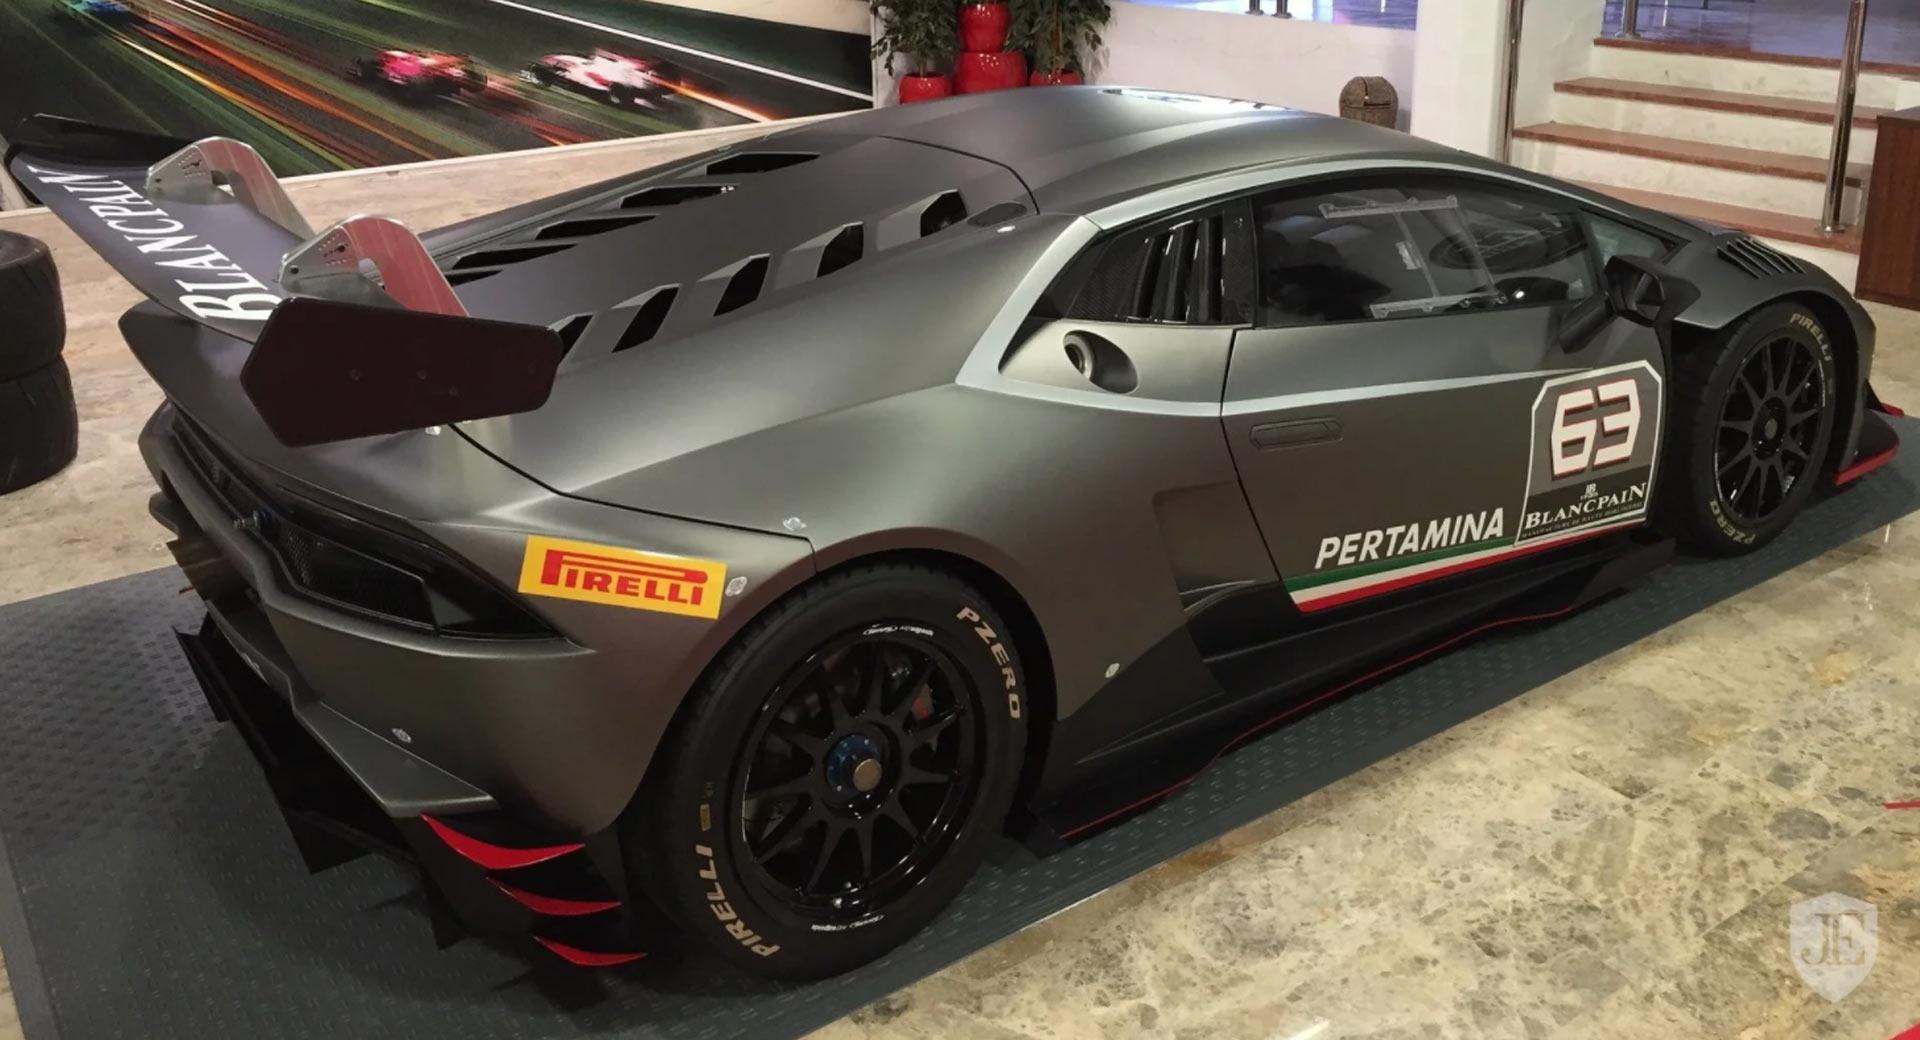 Lamborghini Huracan Super Trofeo for sale (3)